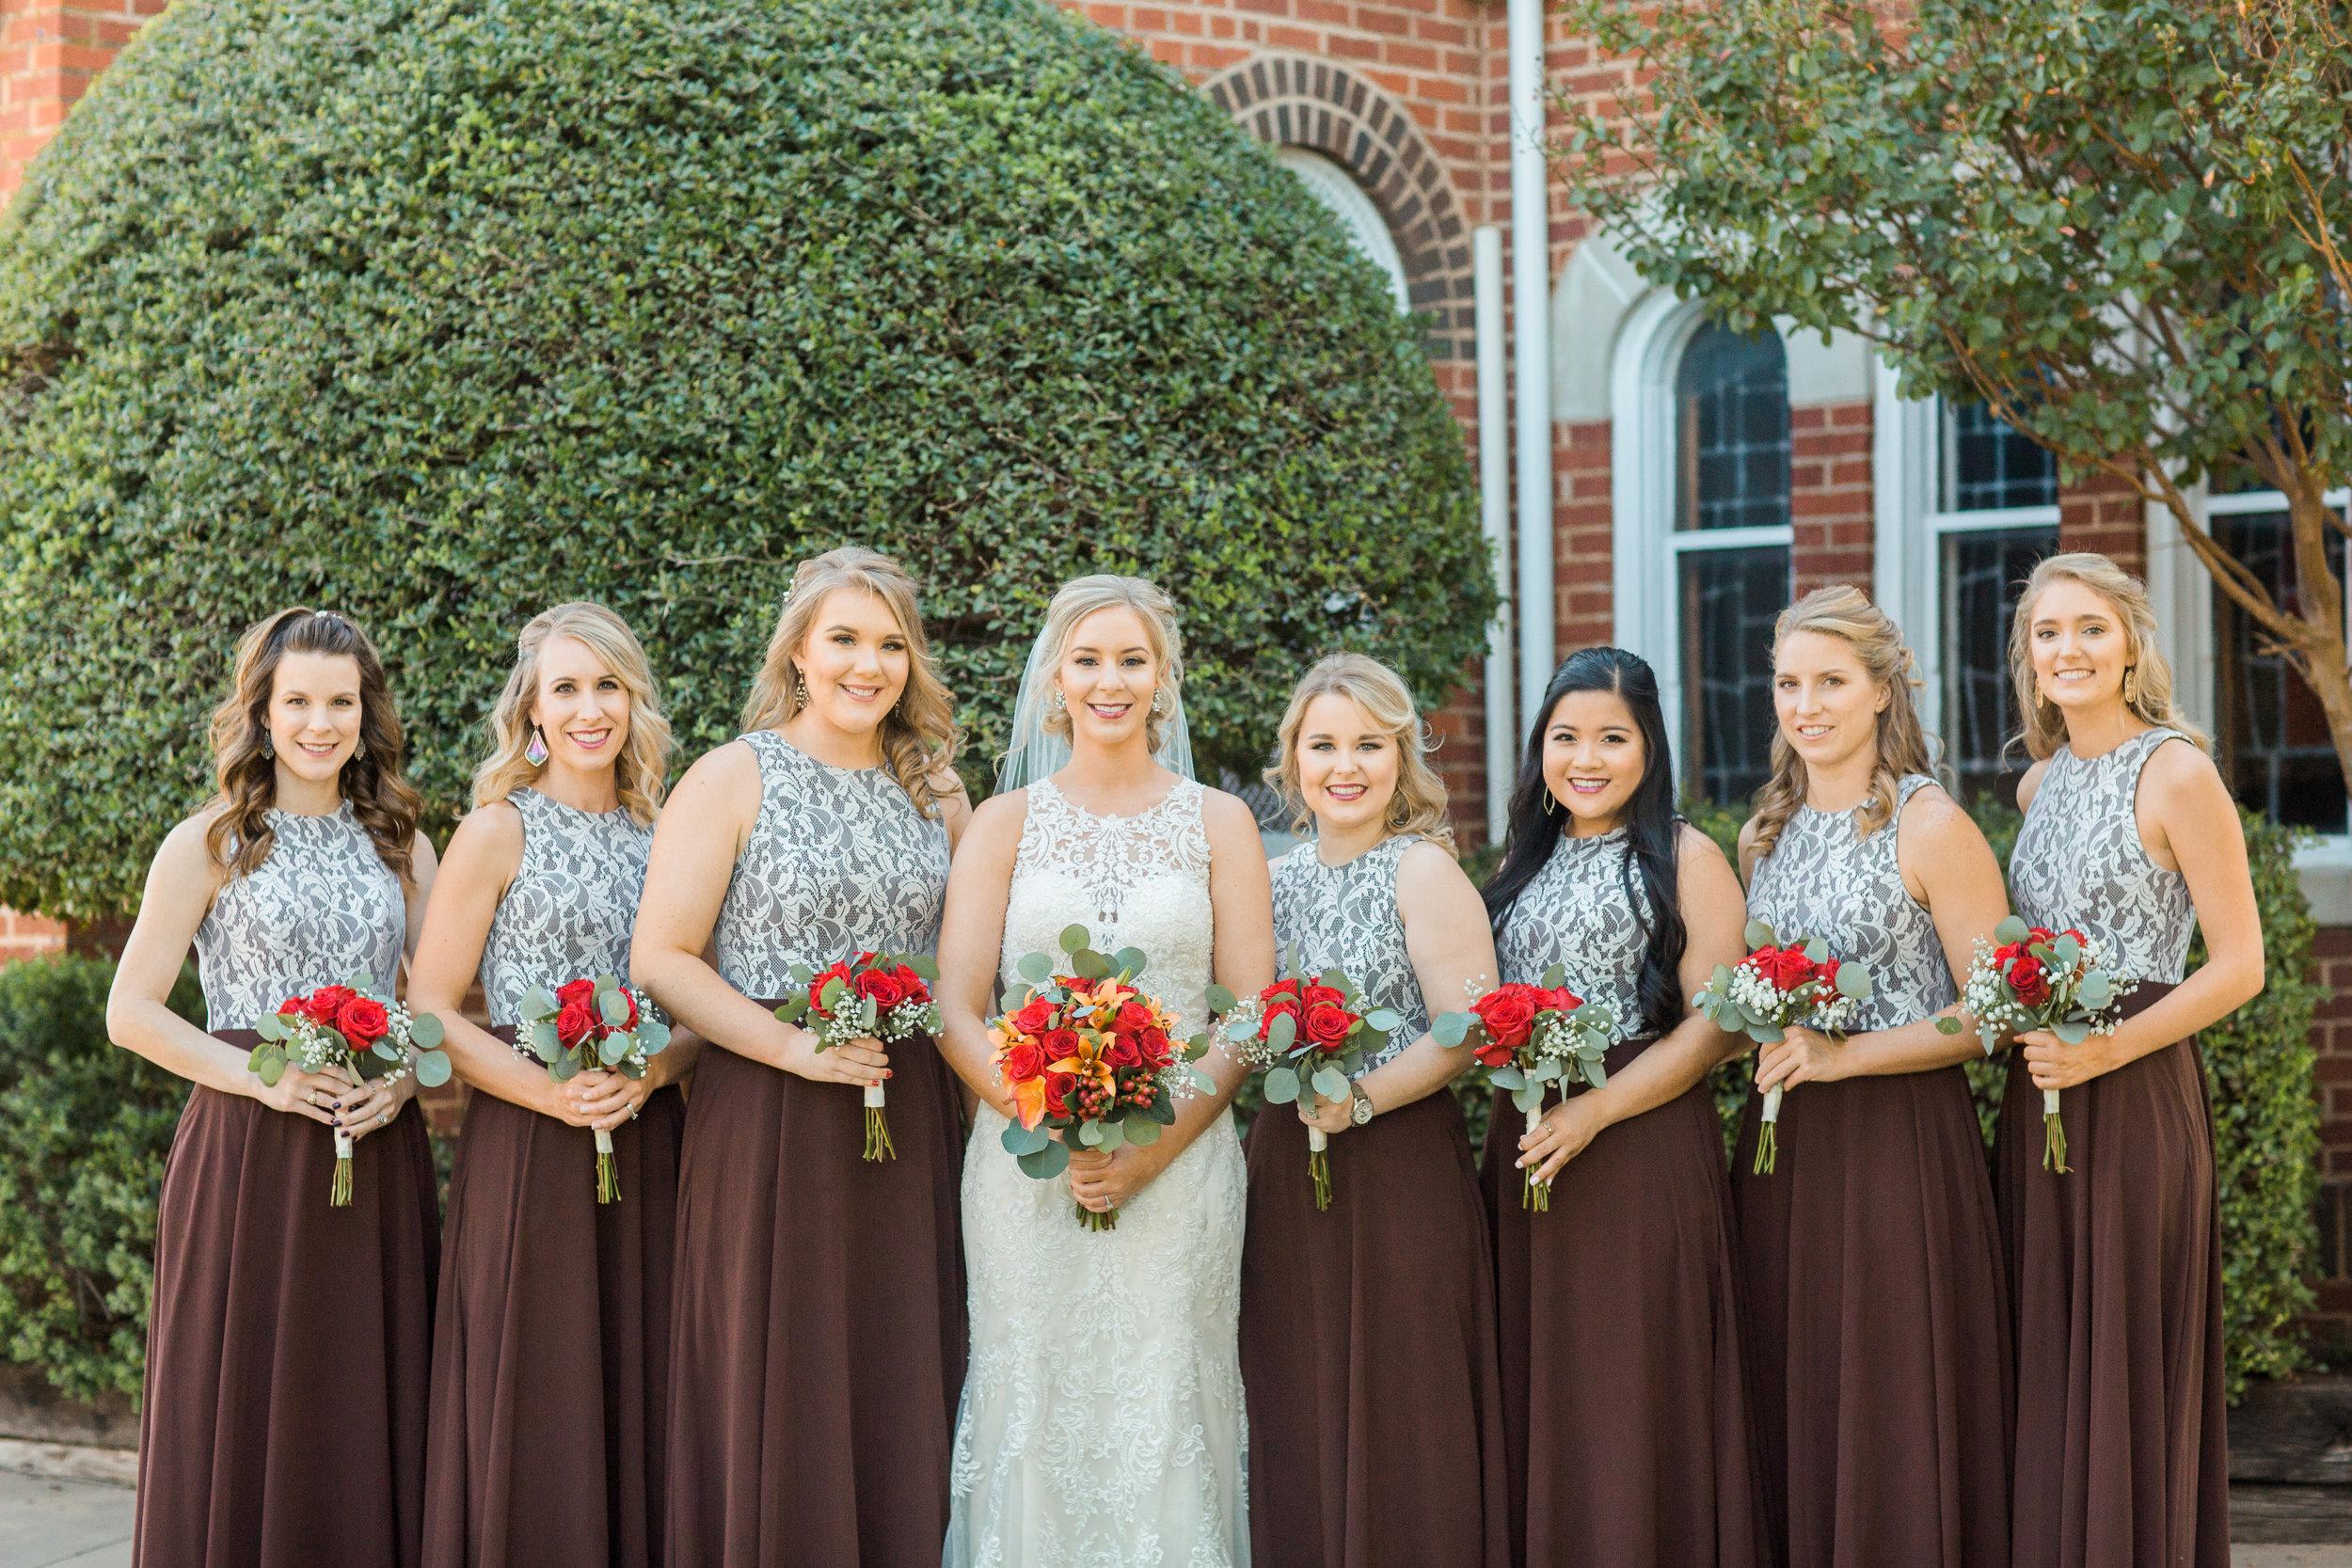 Bailey-Nathan-Windthorst-Texas-Wedding-019.jpg